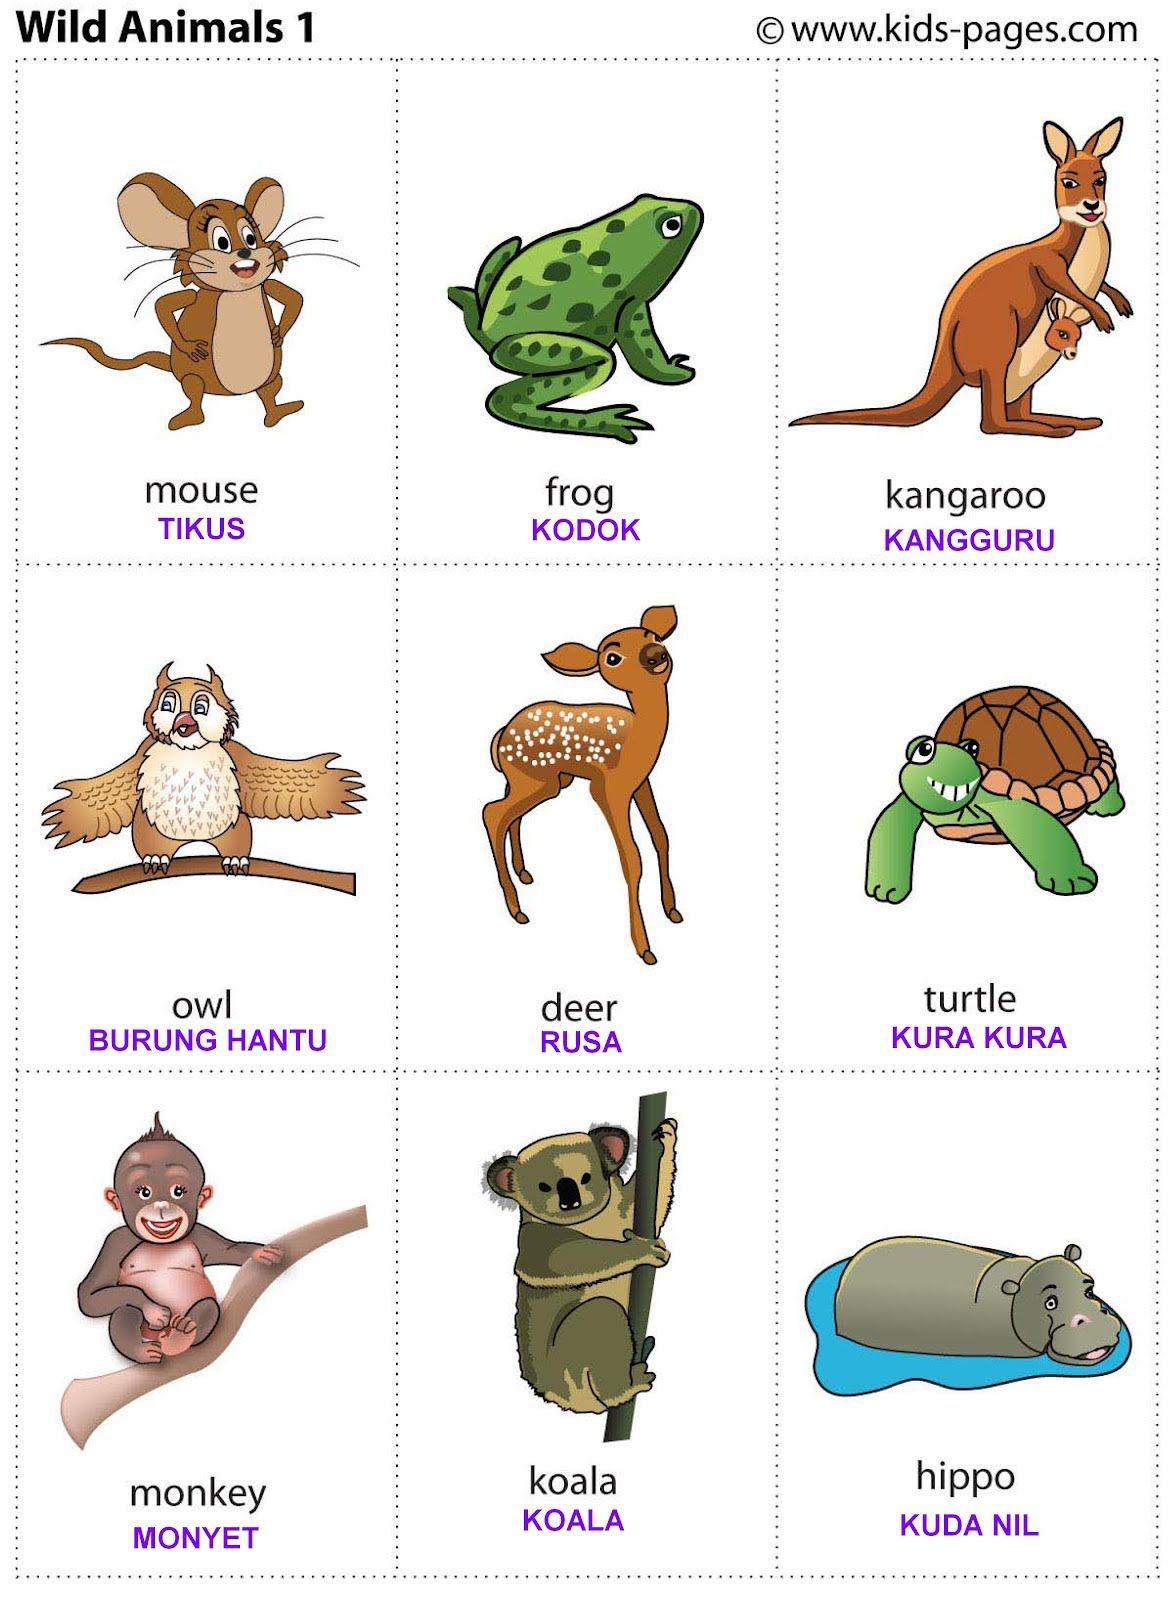 Animaux flash jeu de cartes-educational learning image /& mot fun card pack